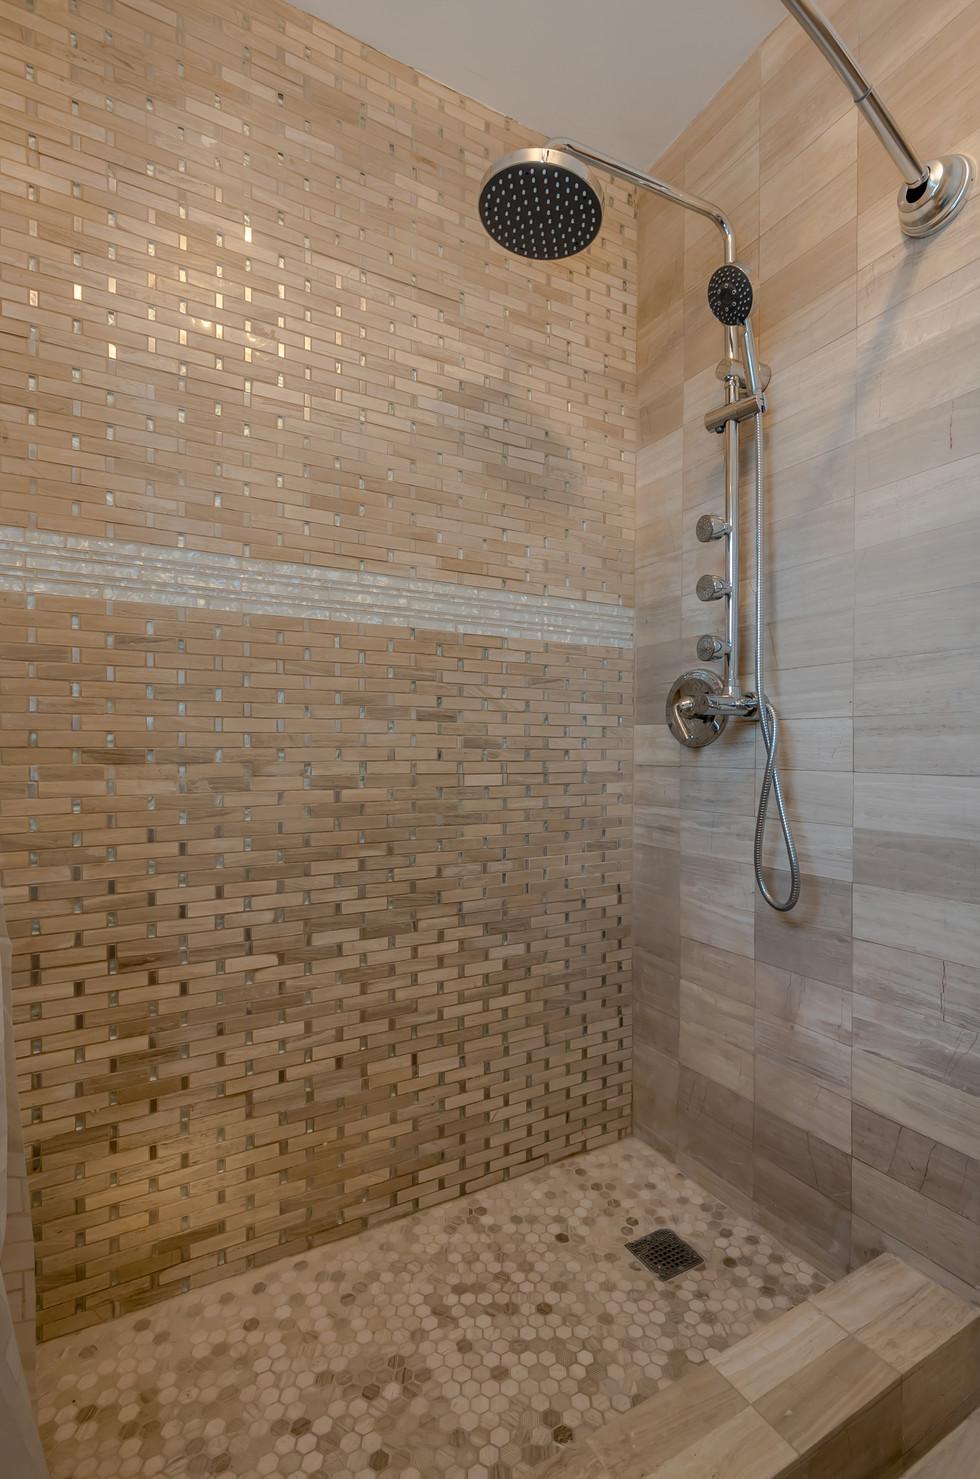 Custom Master Bathroom Shower Remodel Featuring Immaculate Tile Work & Shower Bar